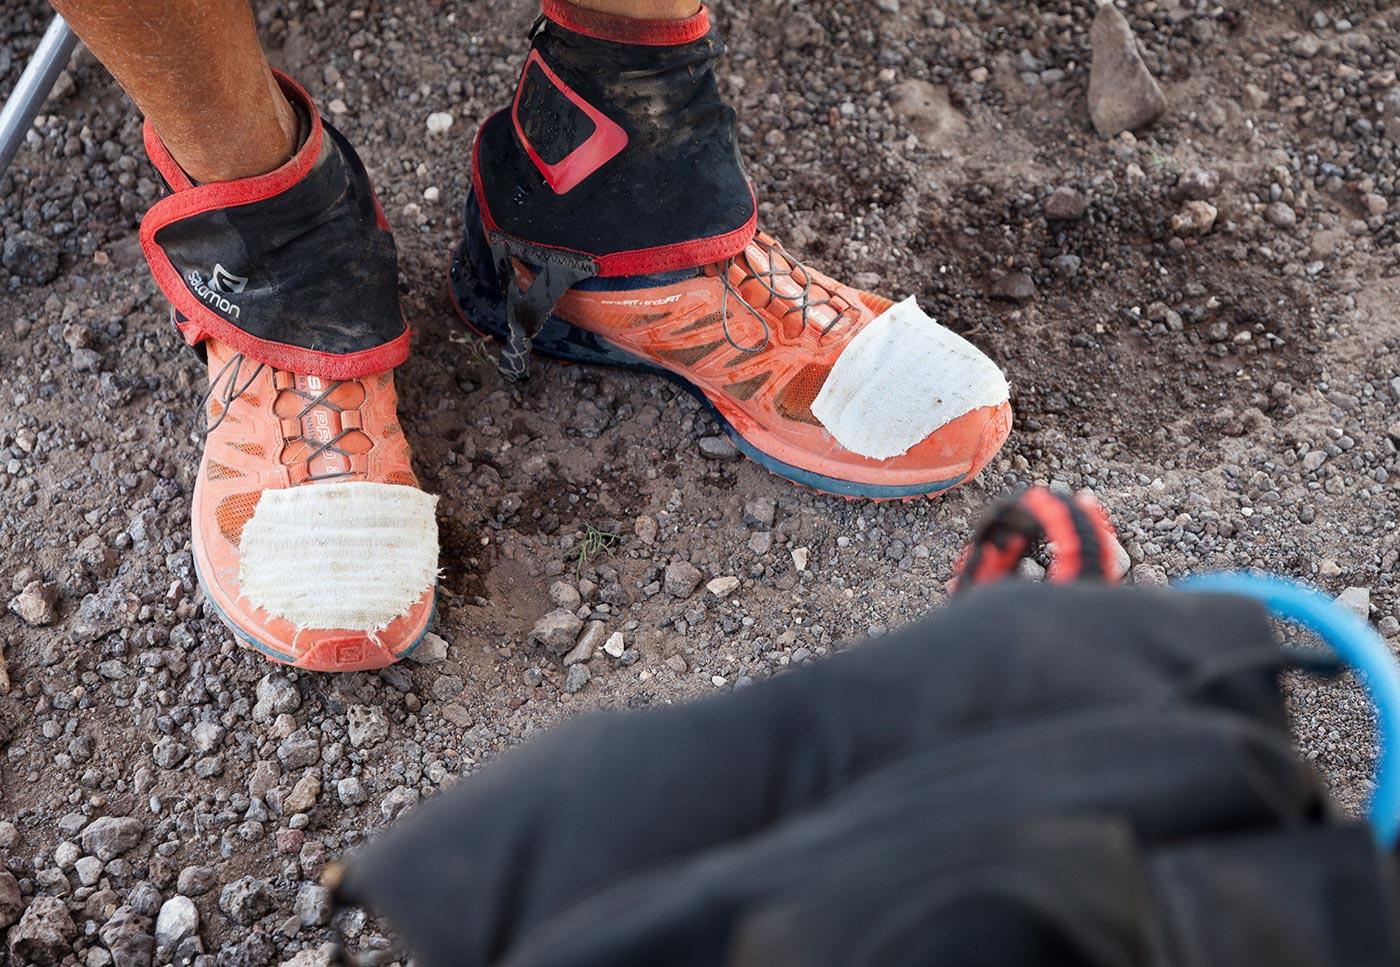 Trans-Pecos-Ultra-ABP-shoes.jpg